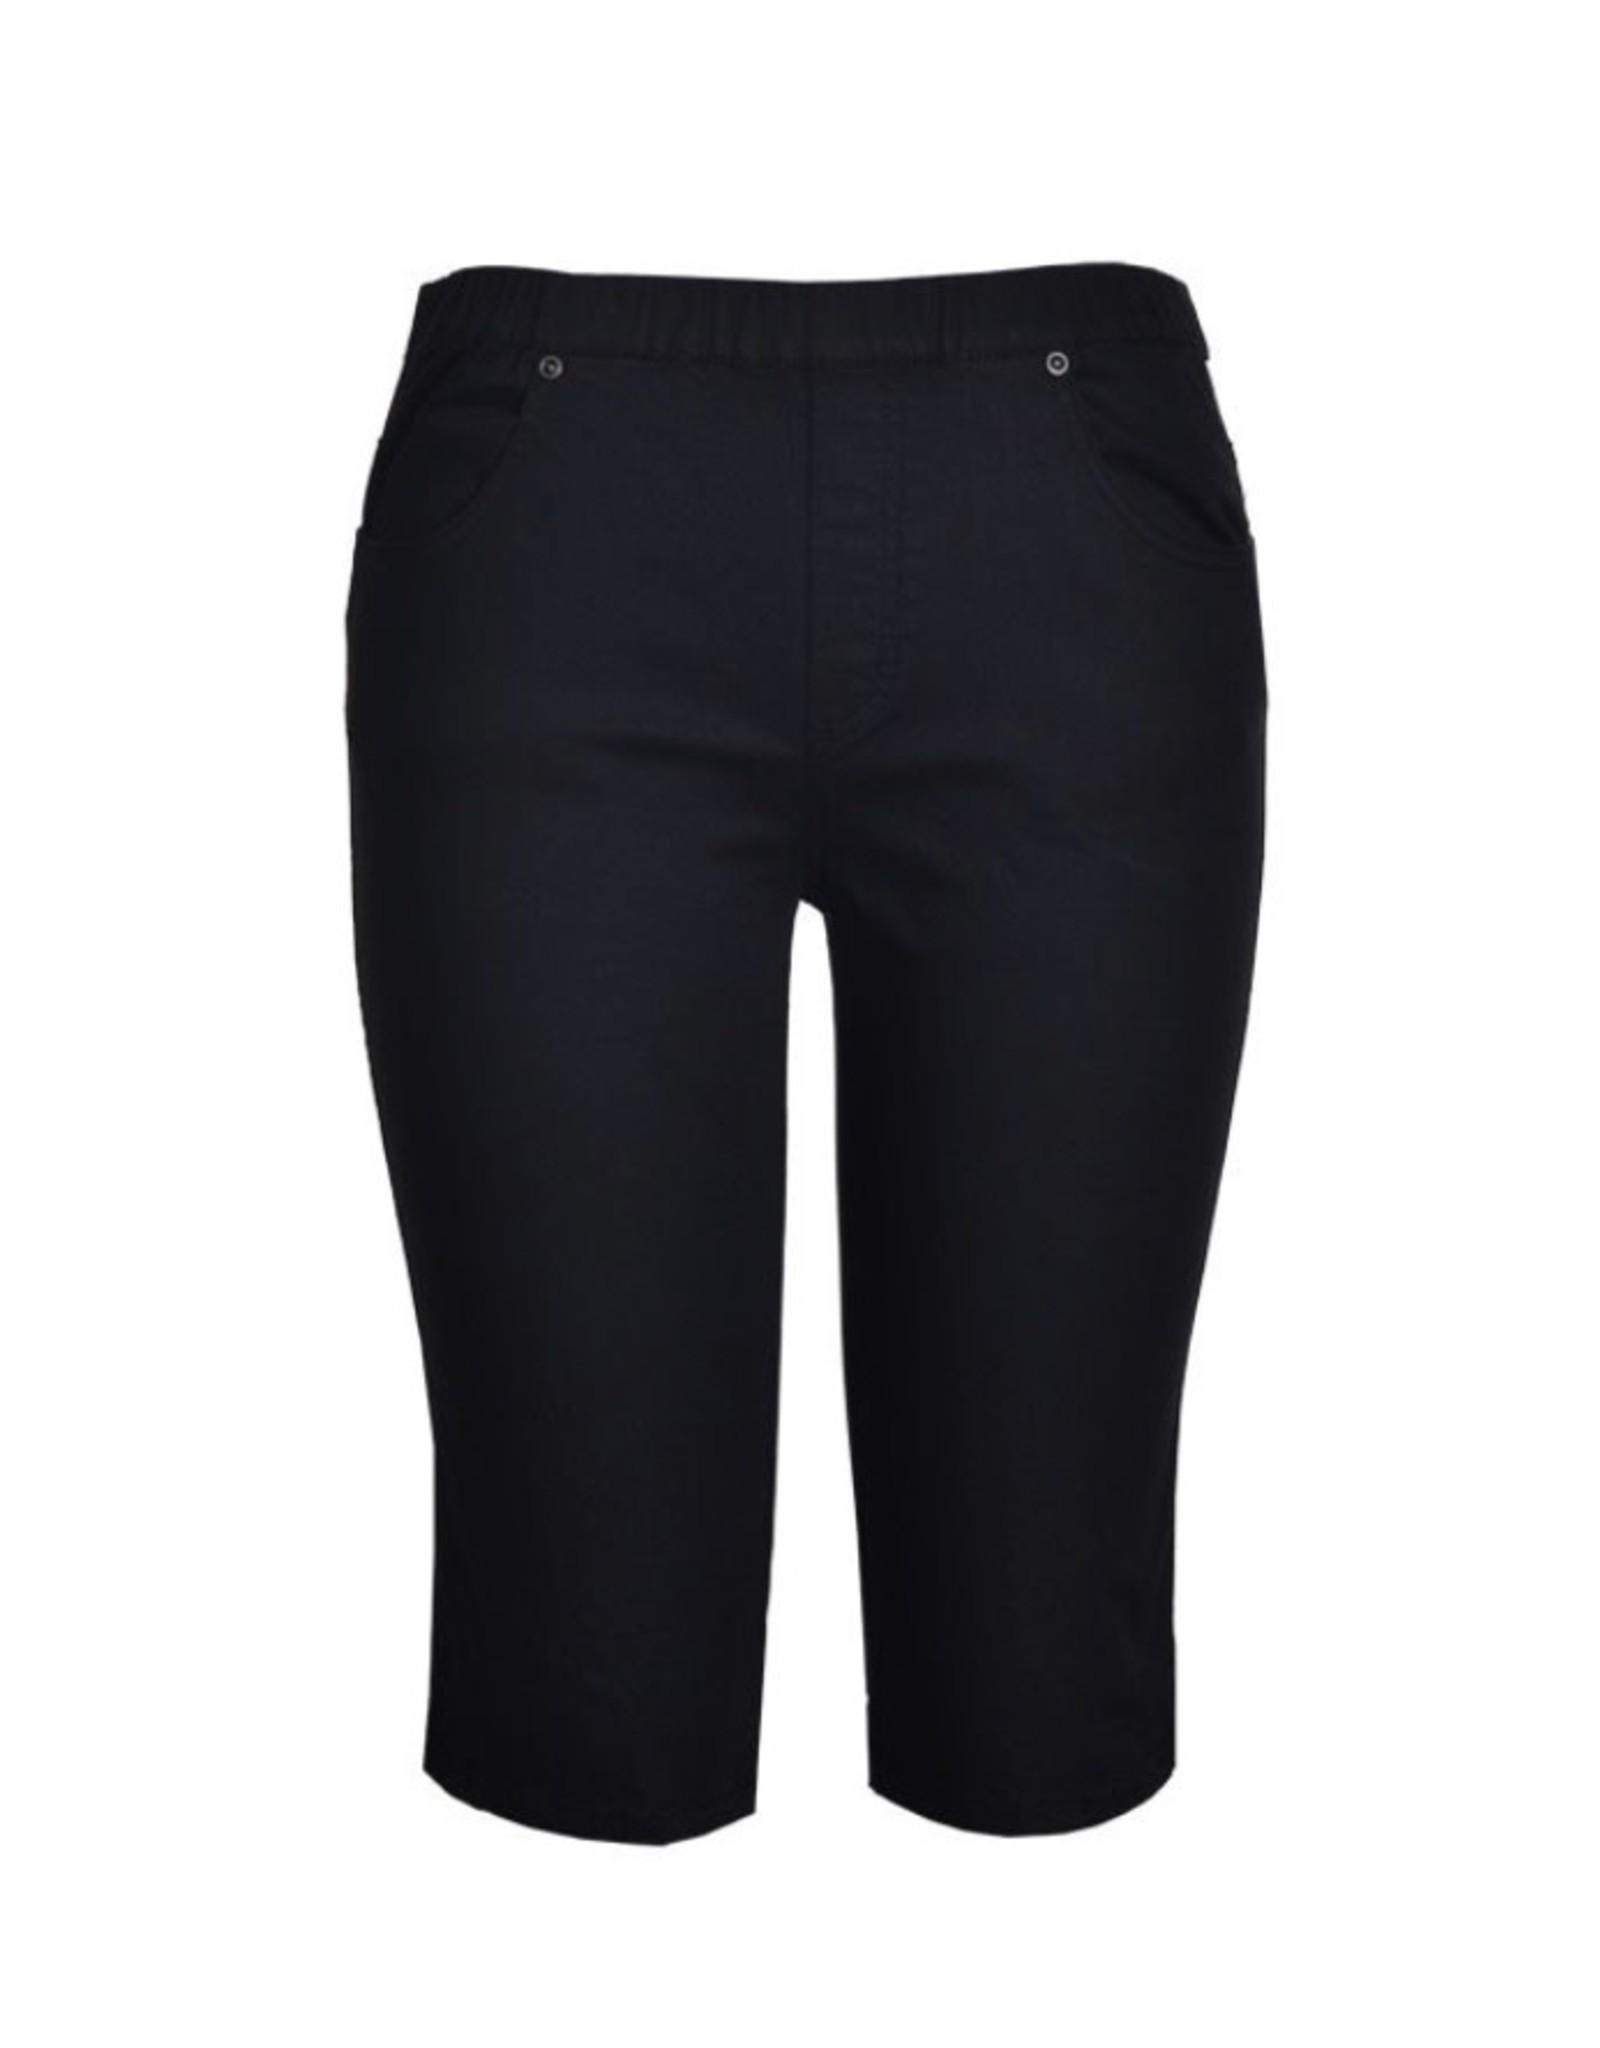 Cafe Latte Cafe Latte - White knee length Cotton Spandex Shorts